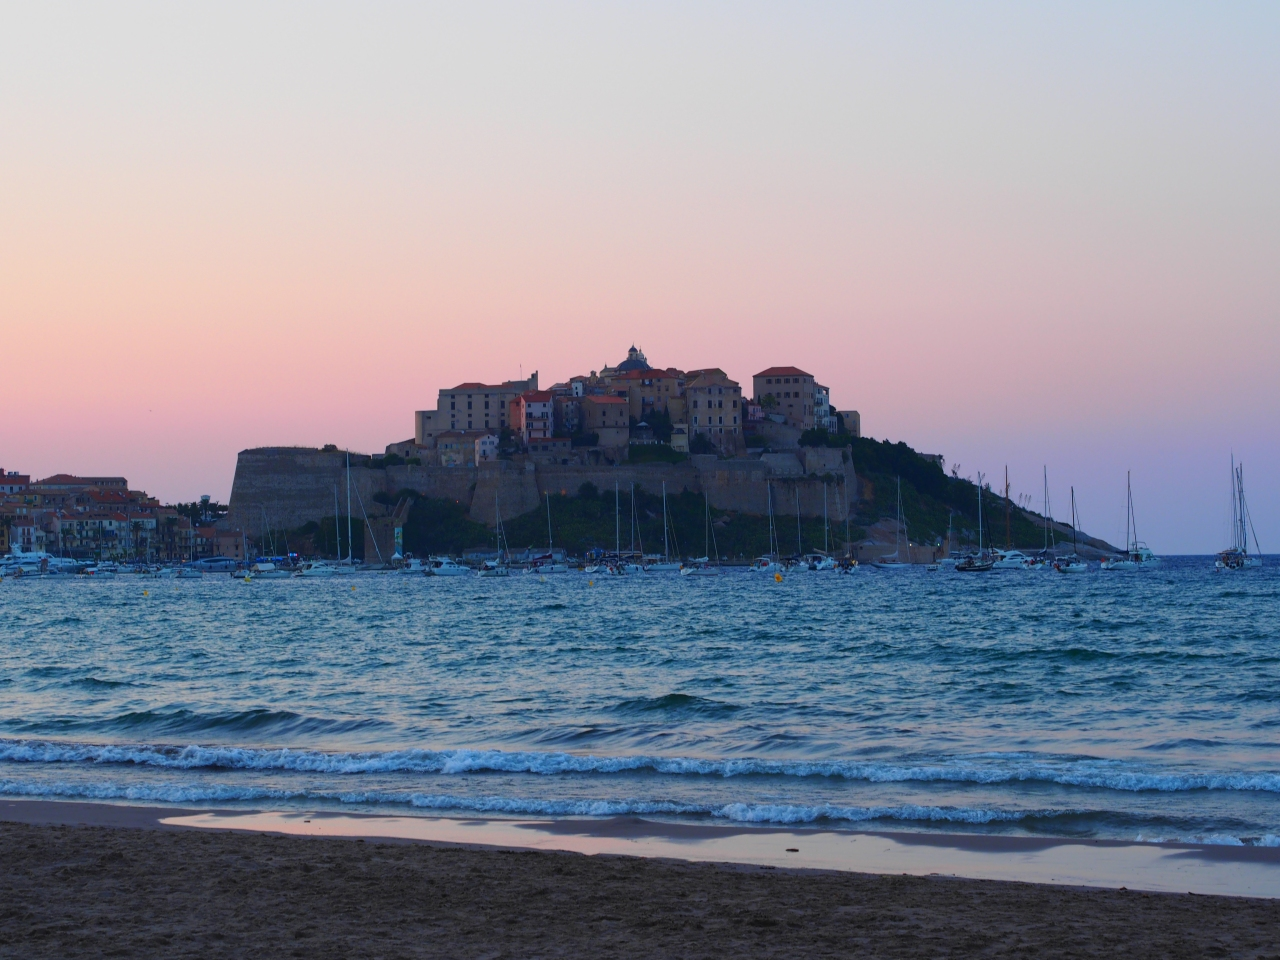 La citadelle de Calvi - Olympus OMD-EM5